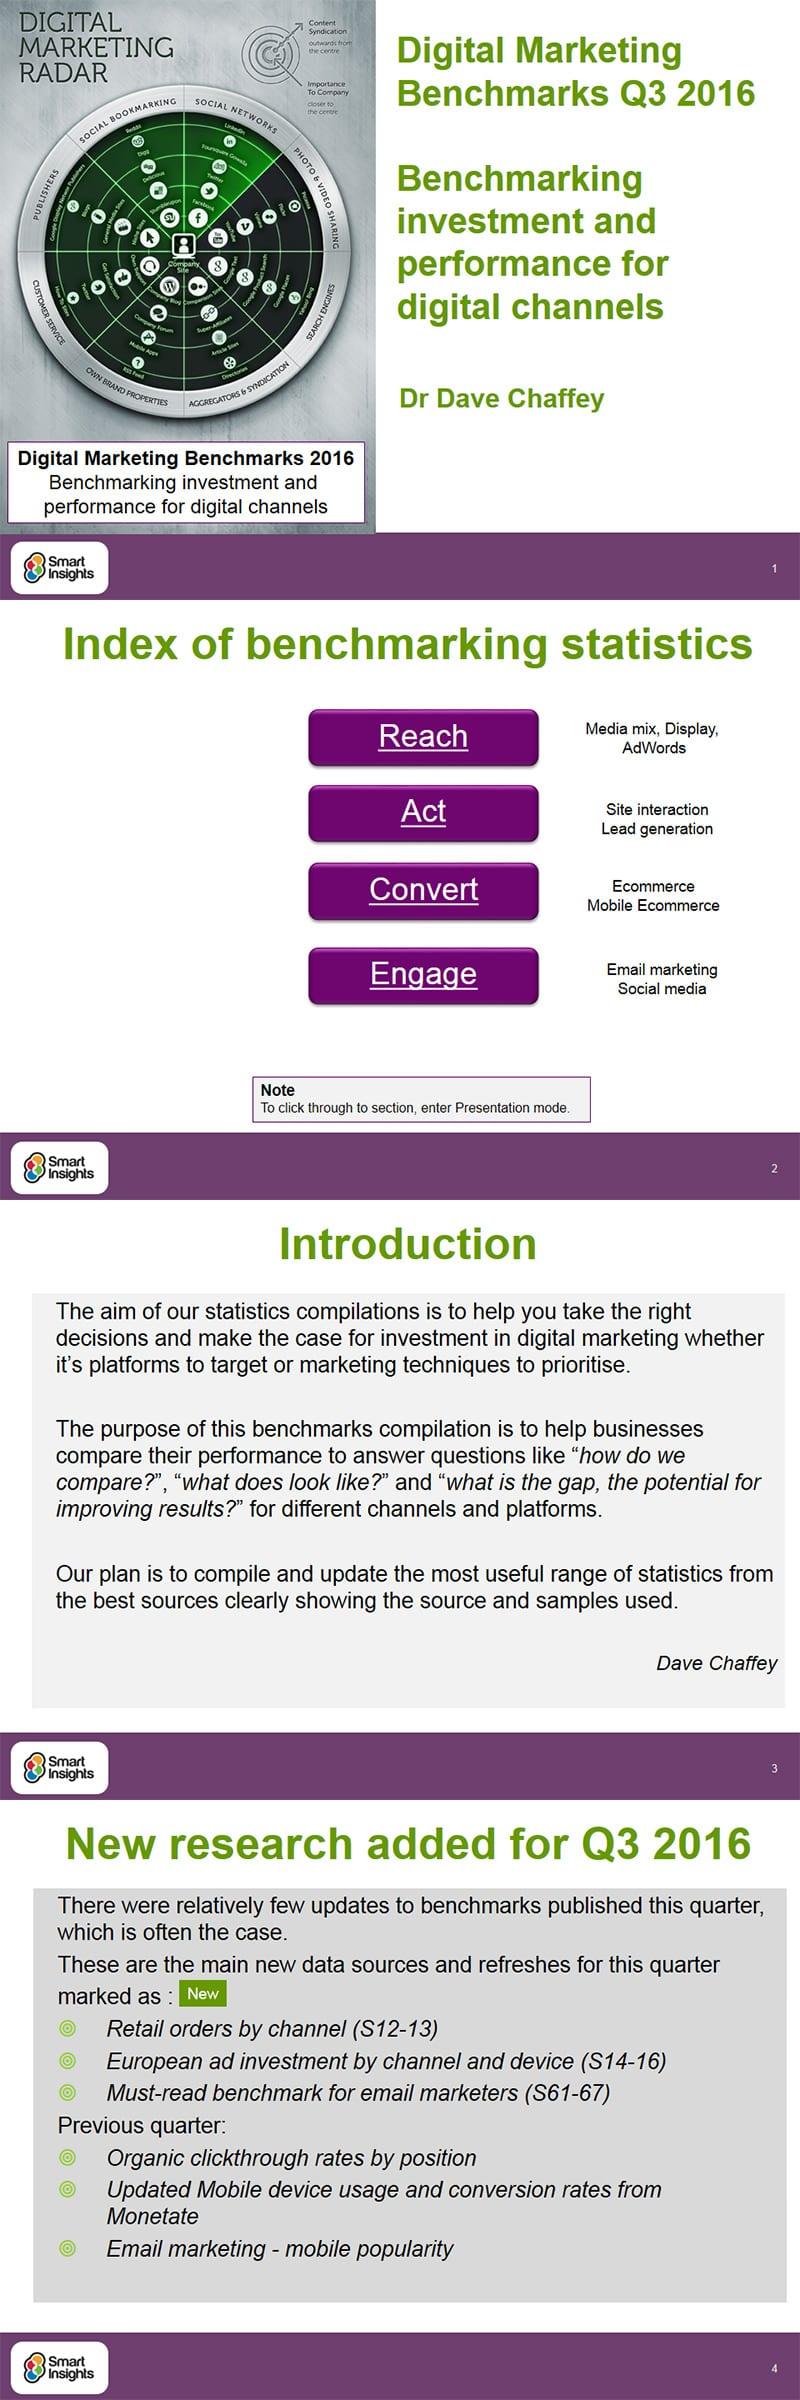 Q1 2017 Online Marketing Benchmarks statistics compilation